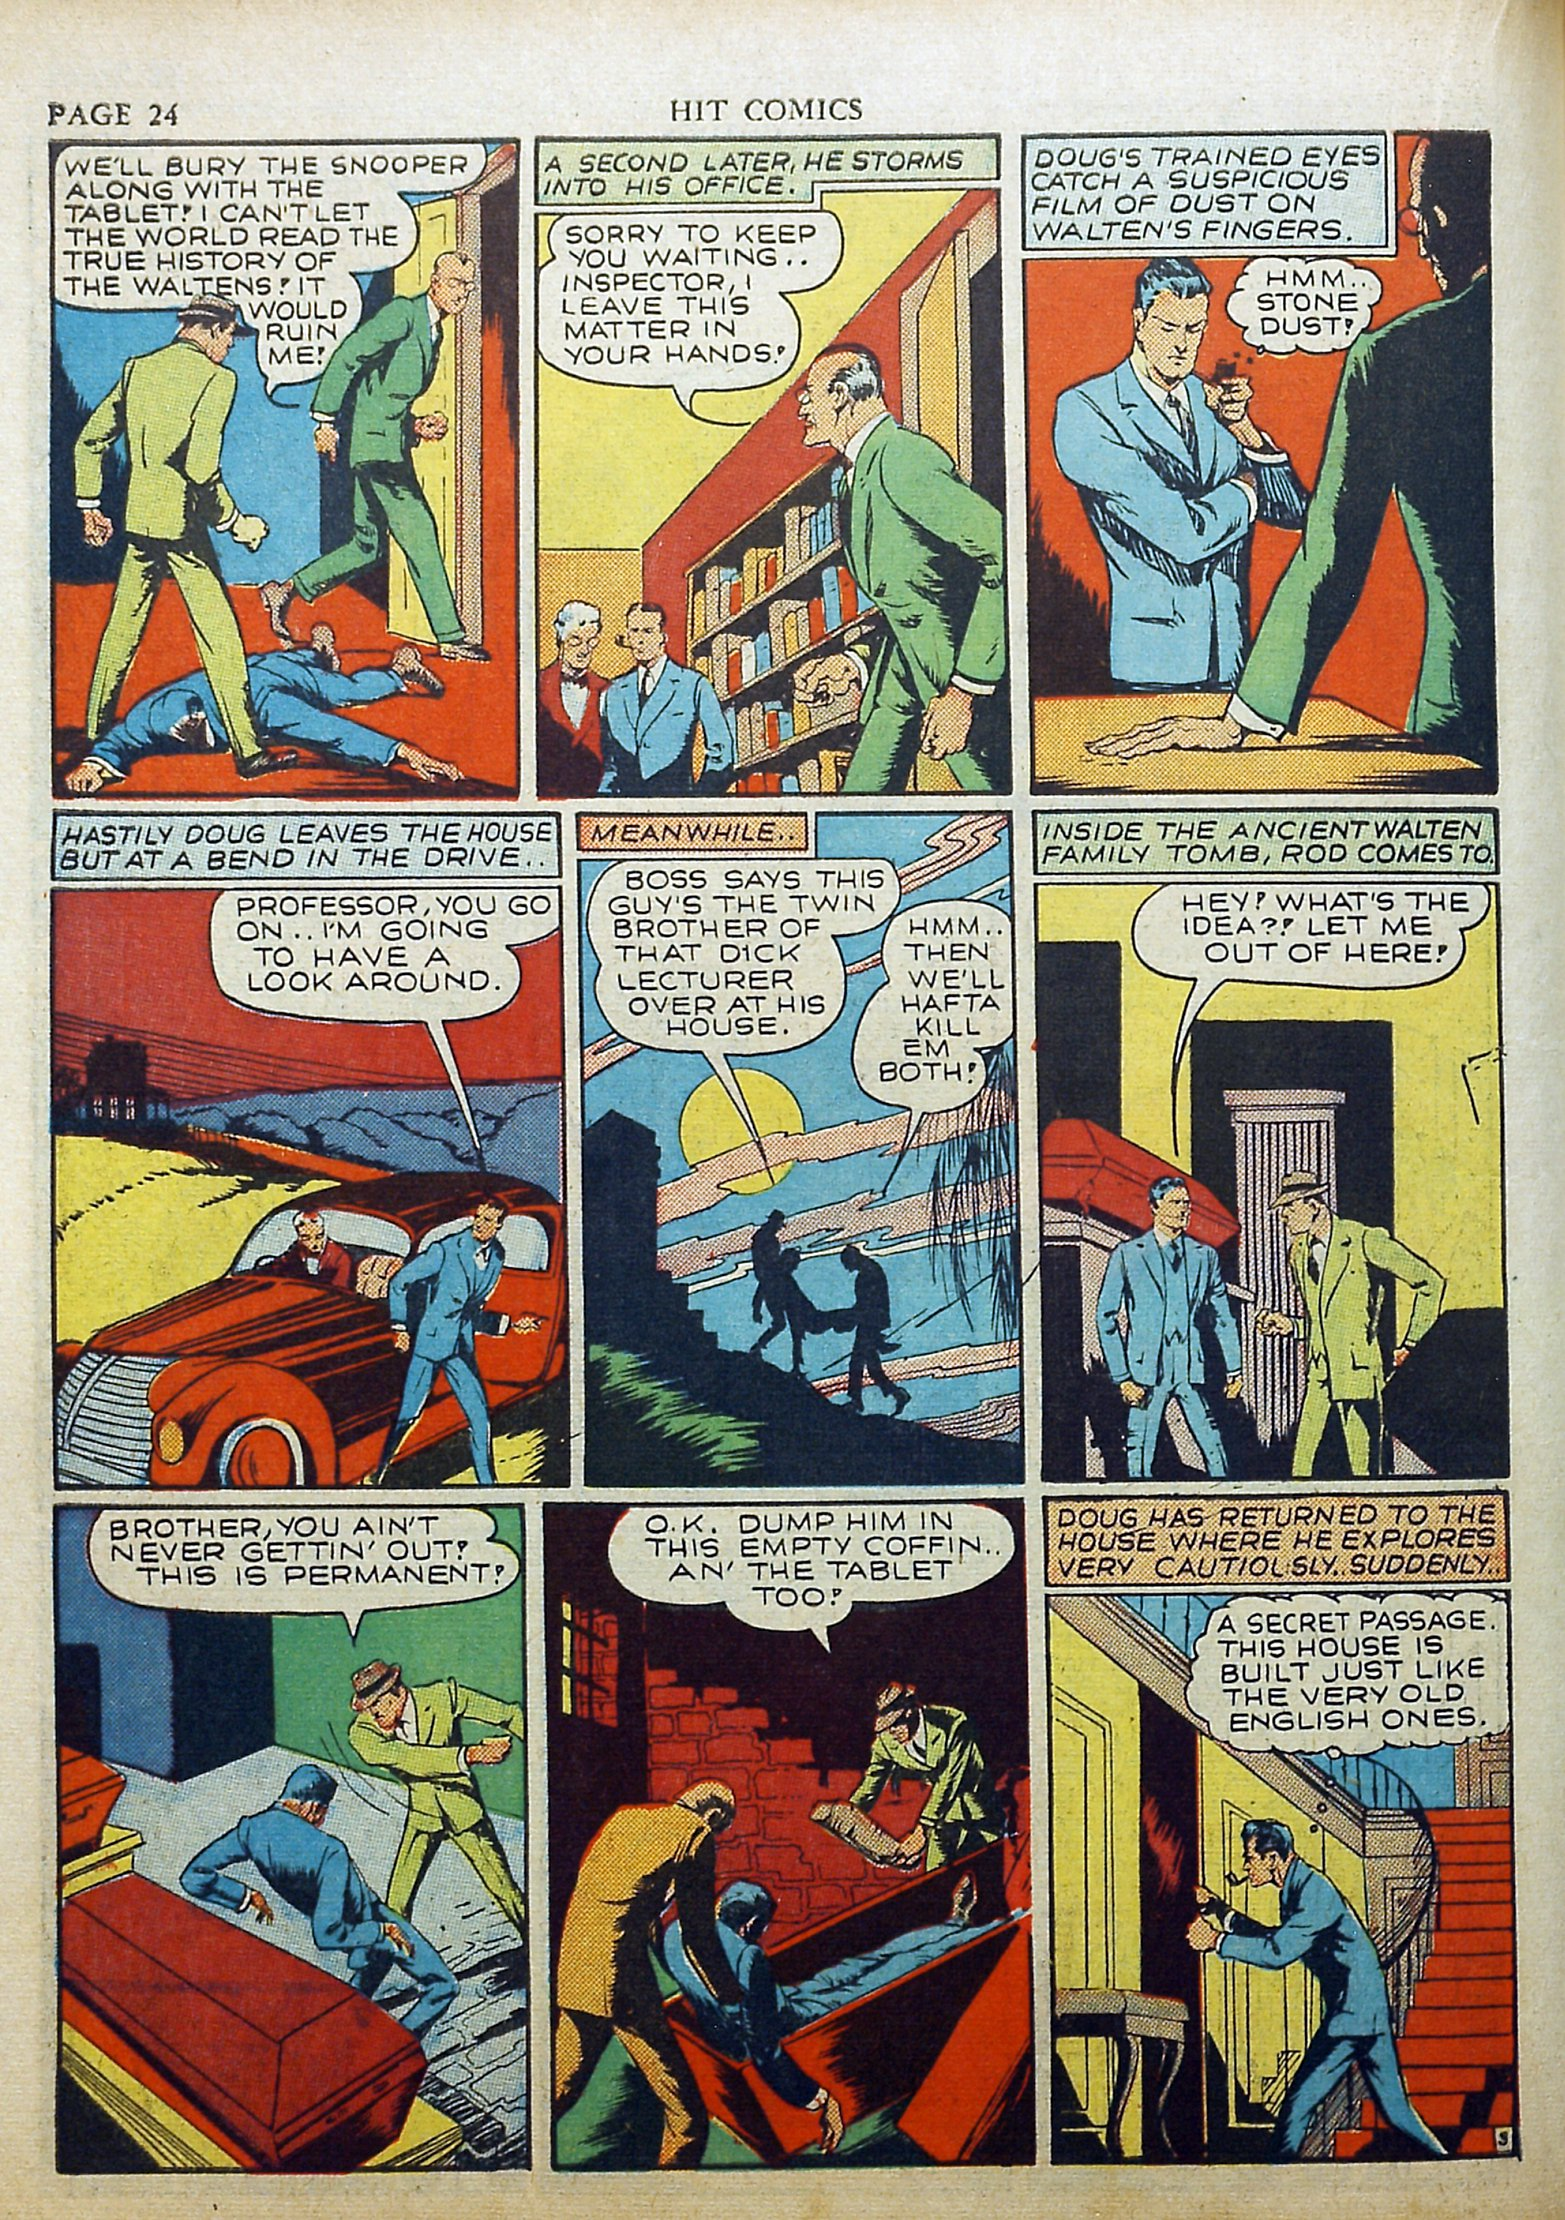 Read online Hit Comics comic -  Issue #17 - 26